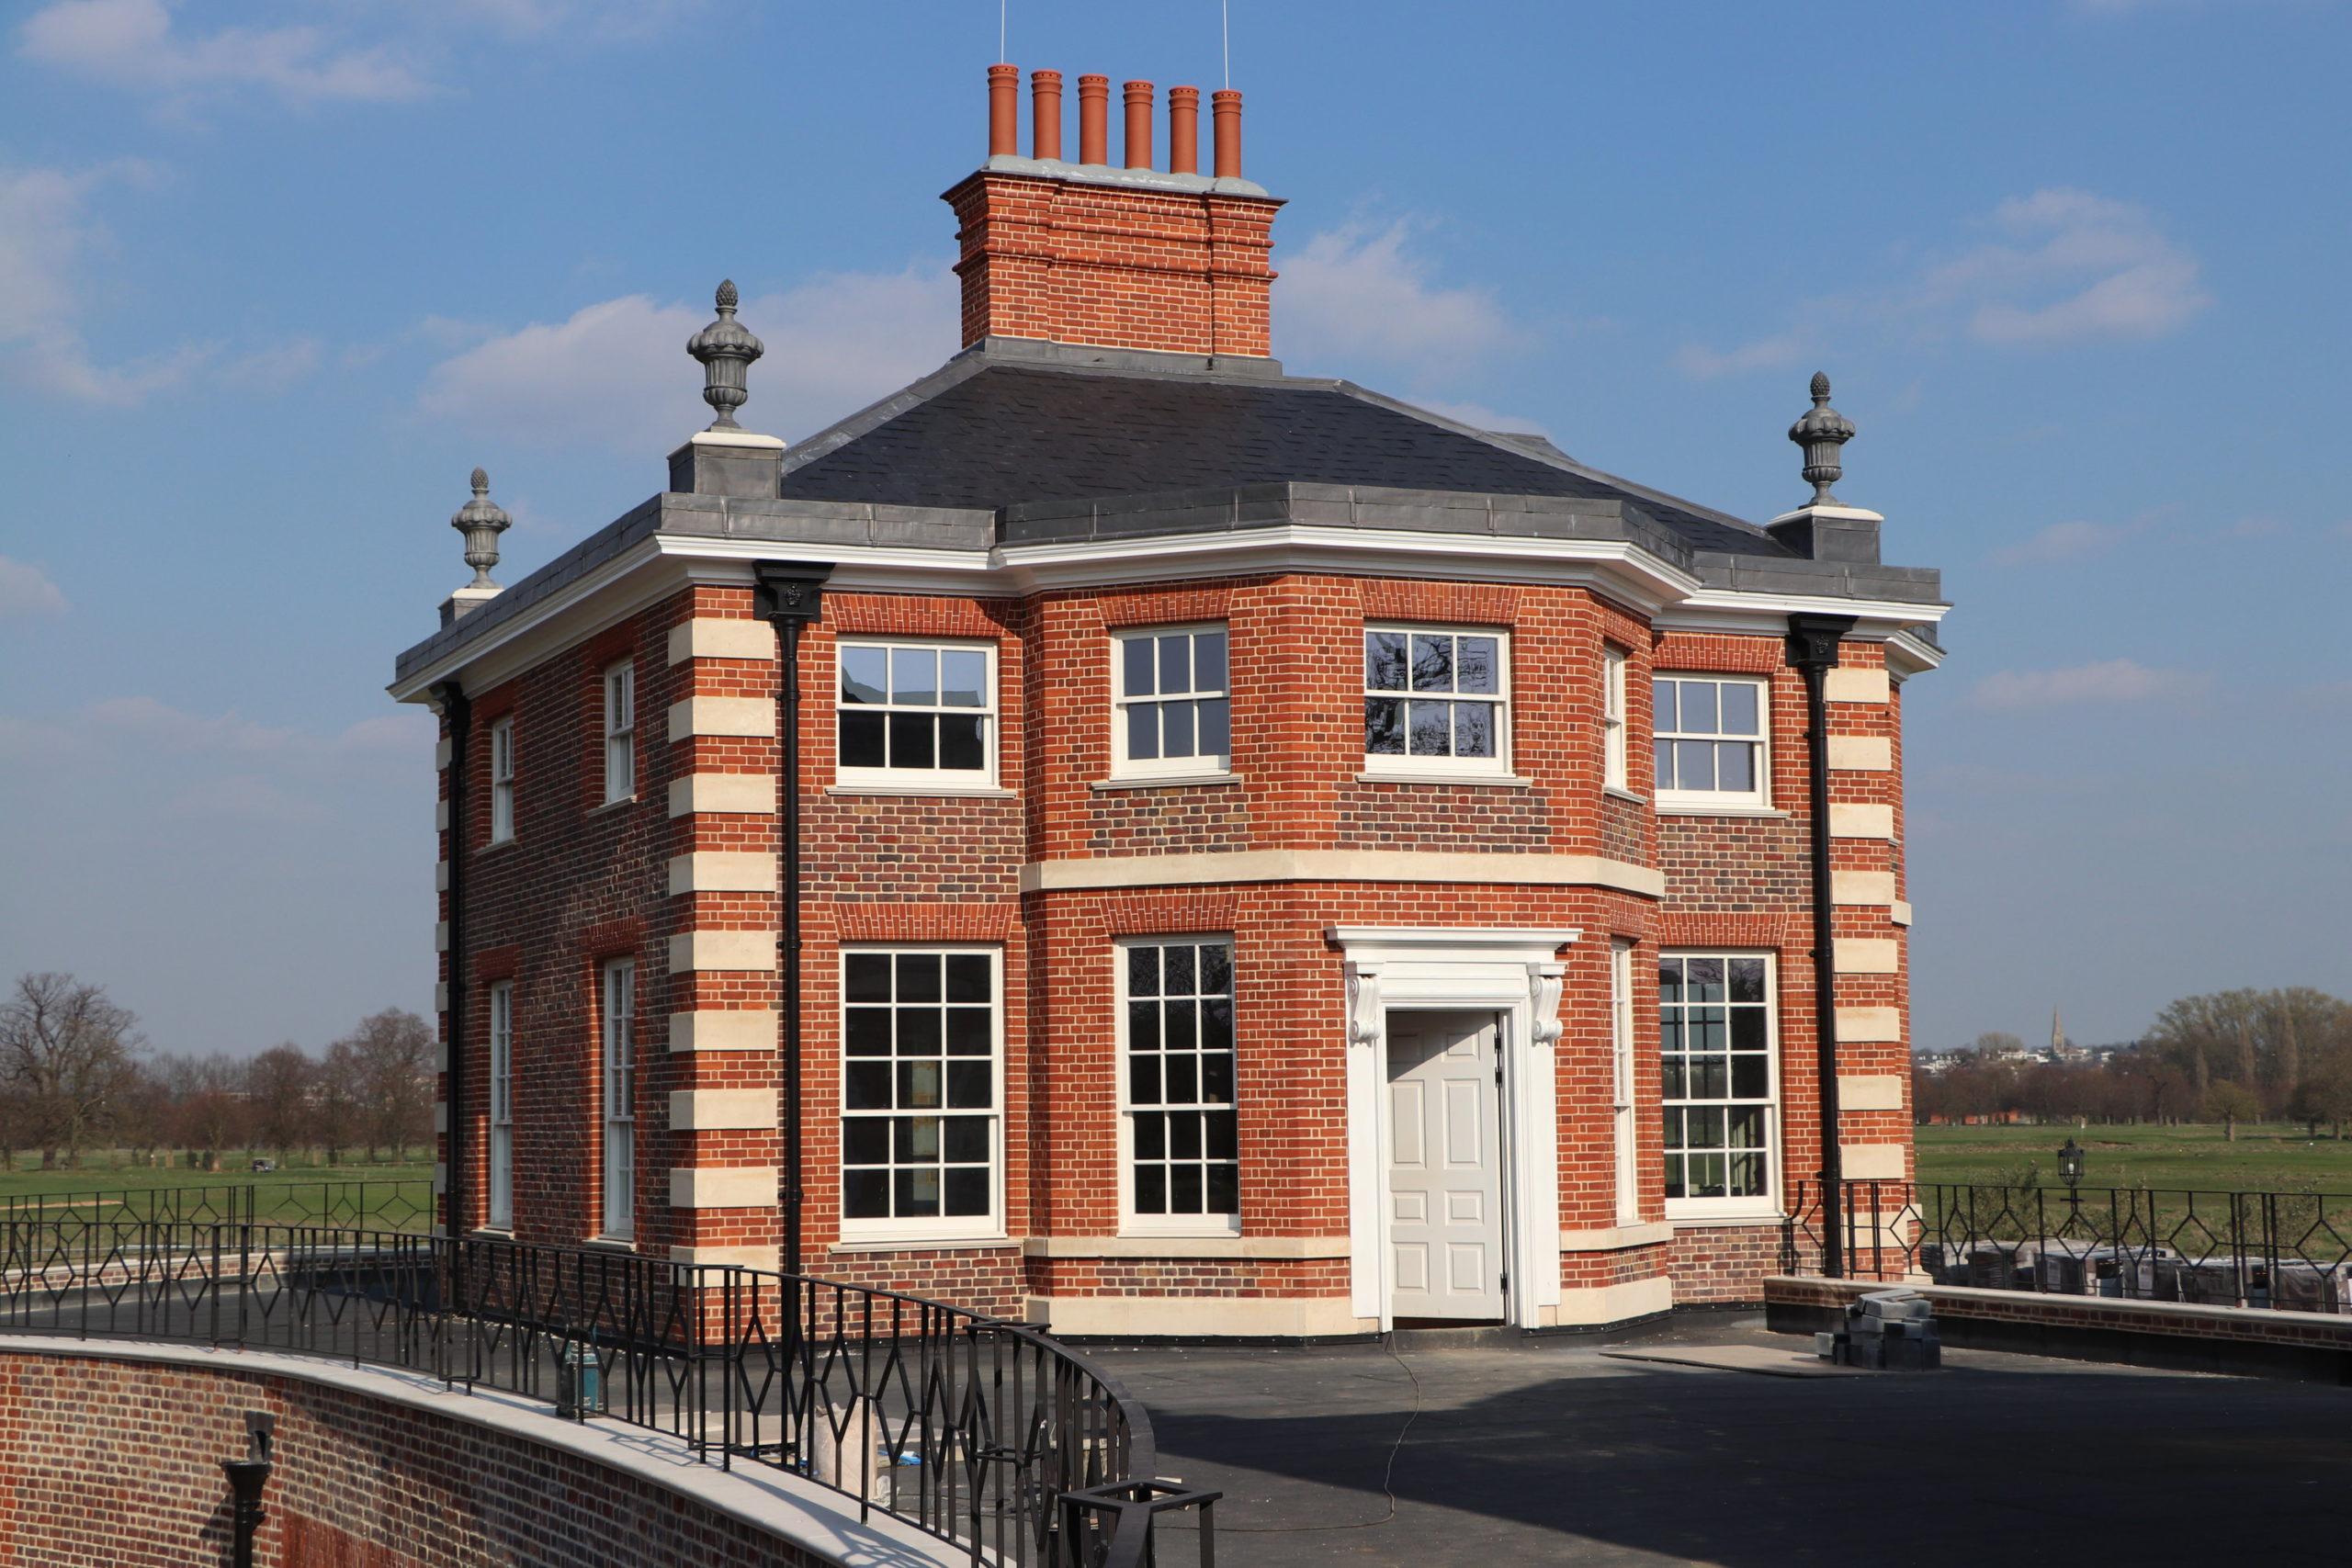 Hampton Court Pavilion, red bricks, stone quoins, chimneys